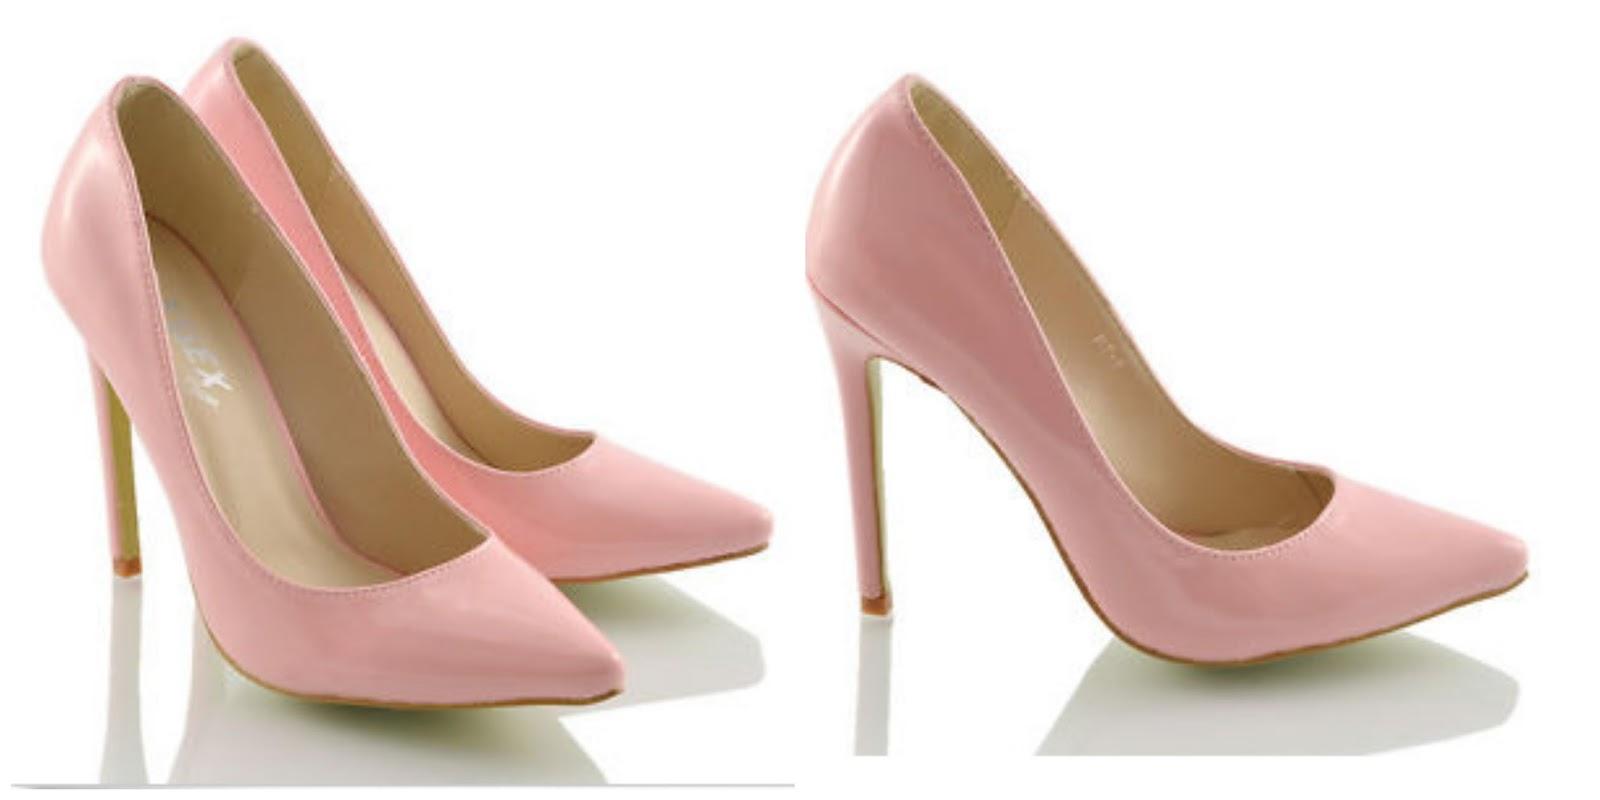 9748c545c63c Ladies Pointed Heels in Pastel Pink Patent - £14.99   £2.99 PnP